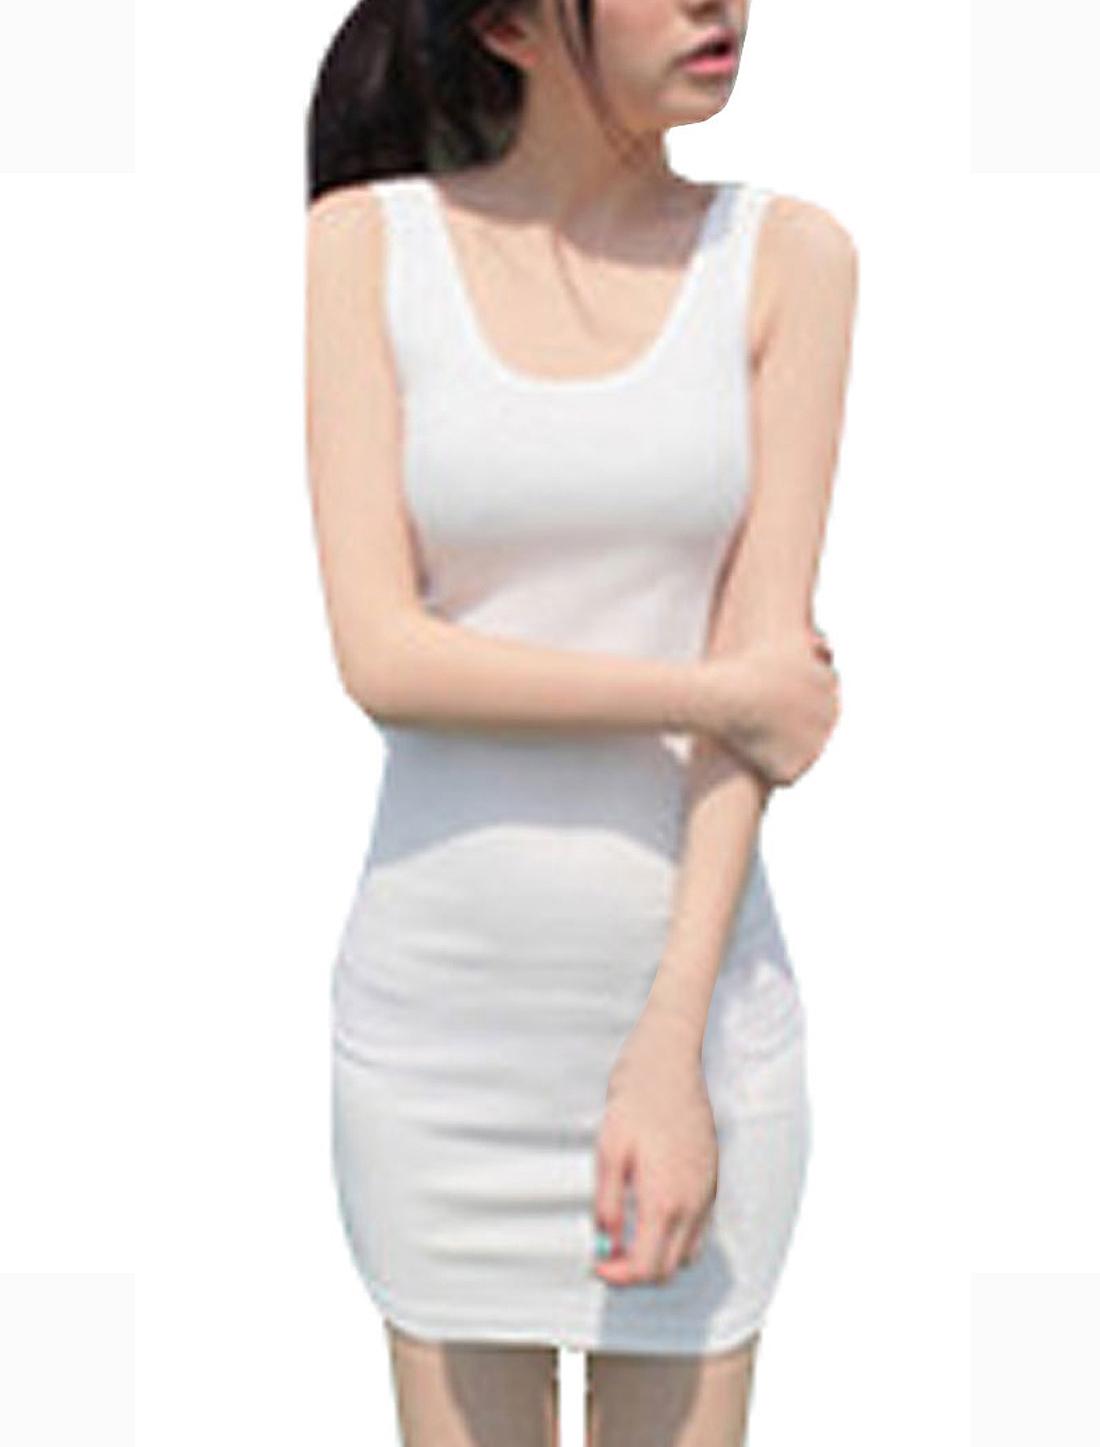 Double U Neck Pure White Closefitting Mini Dress XS for Women